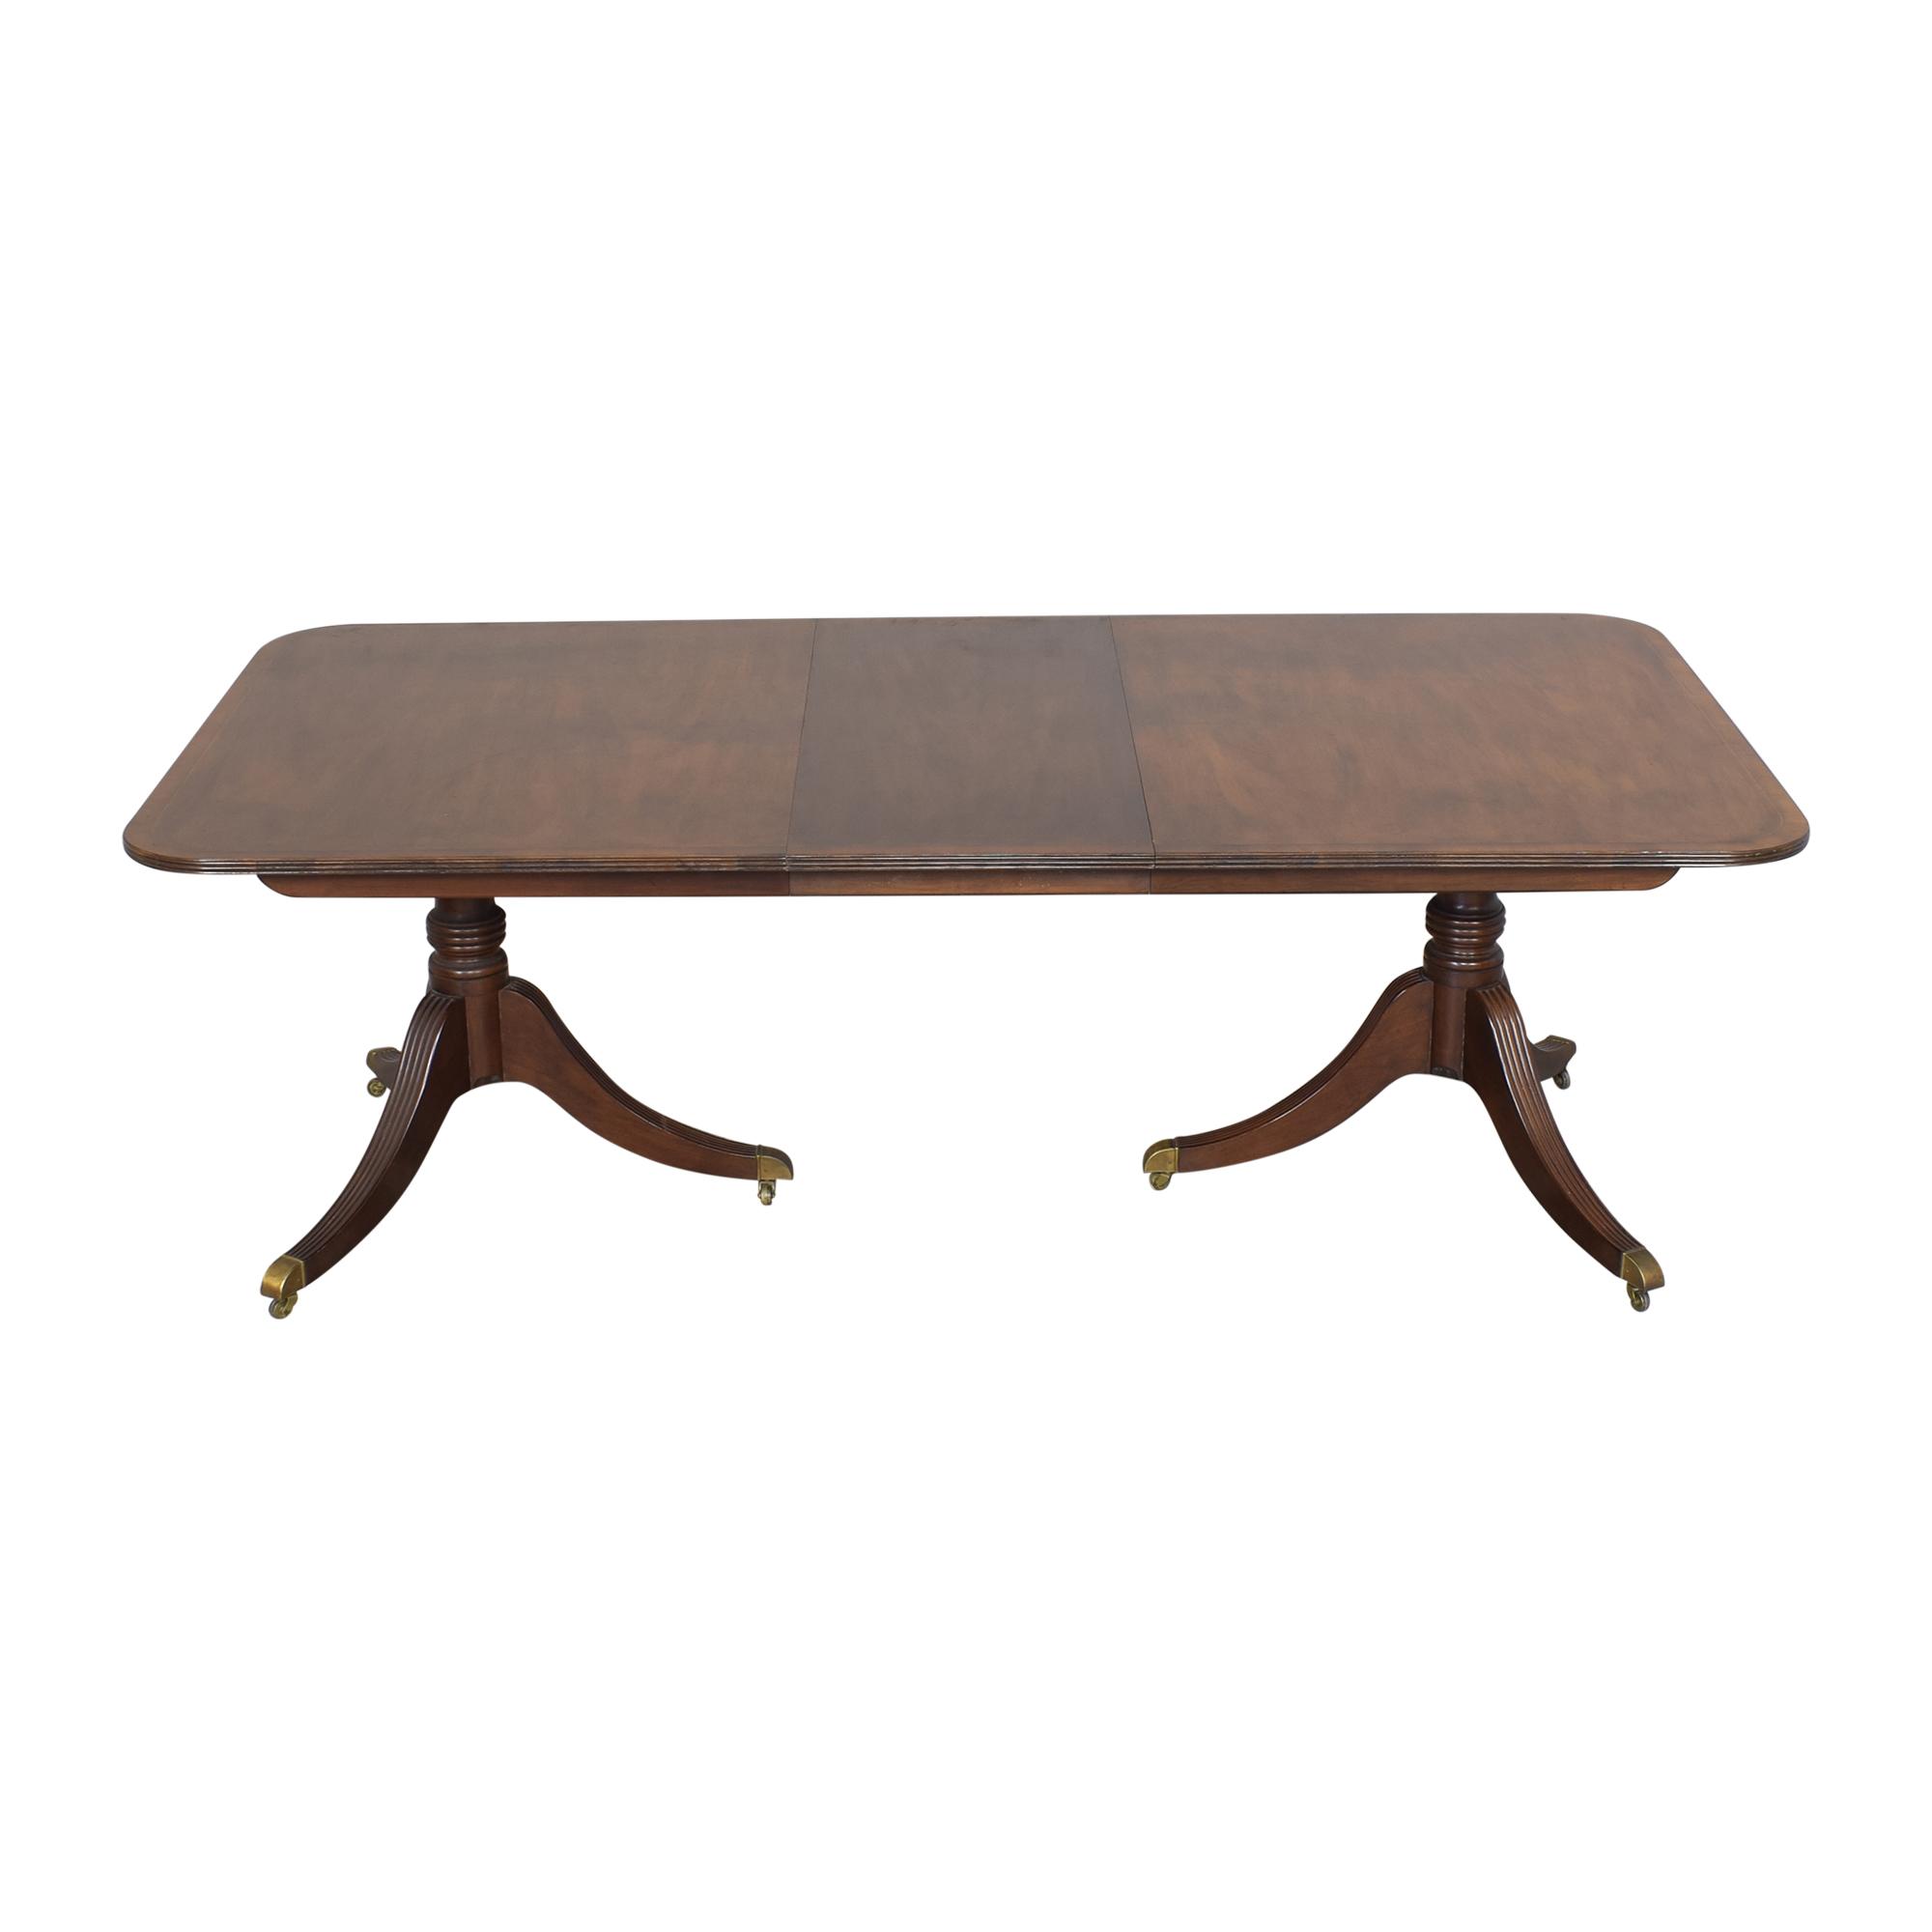 buy Baker Furniture Baker Furniture Extendable Double Pedestal Dining Table online